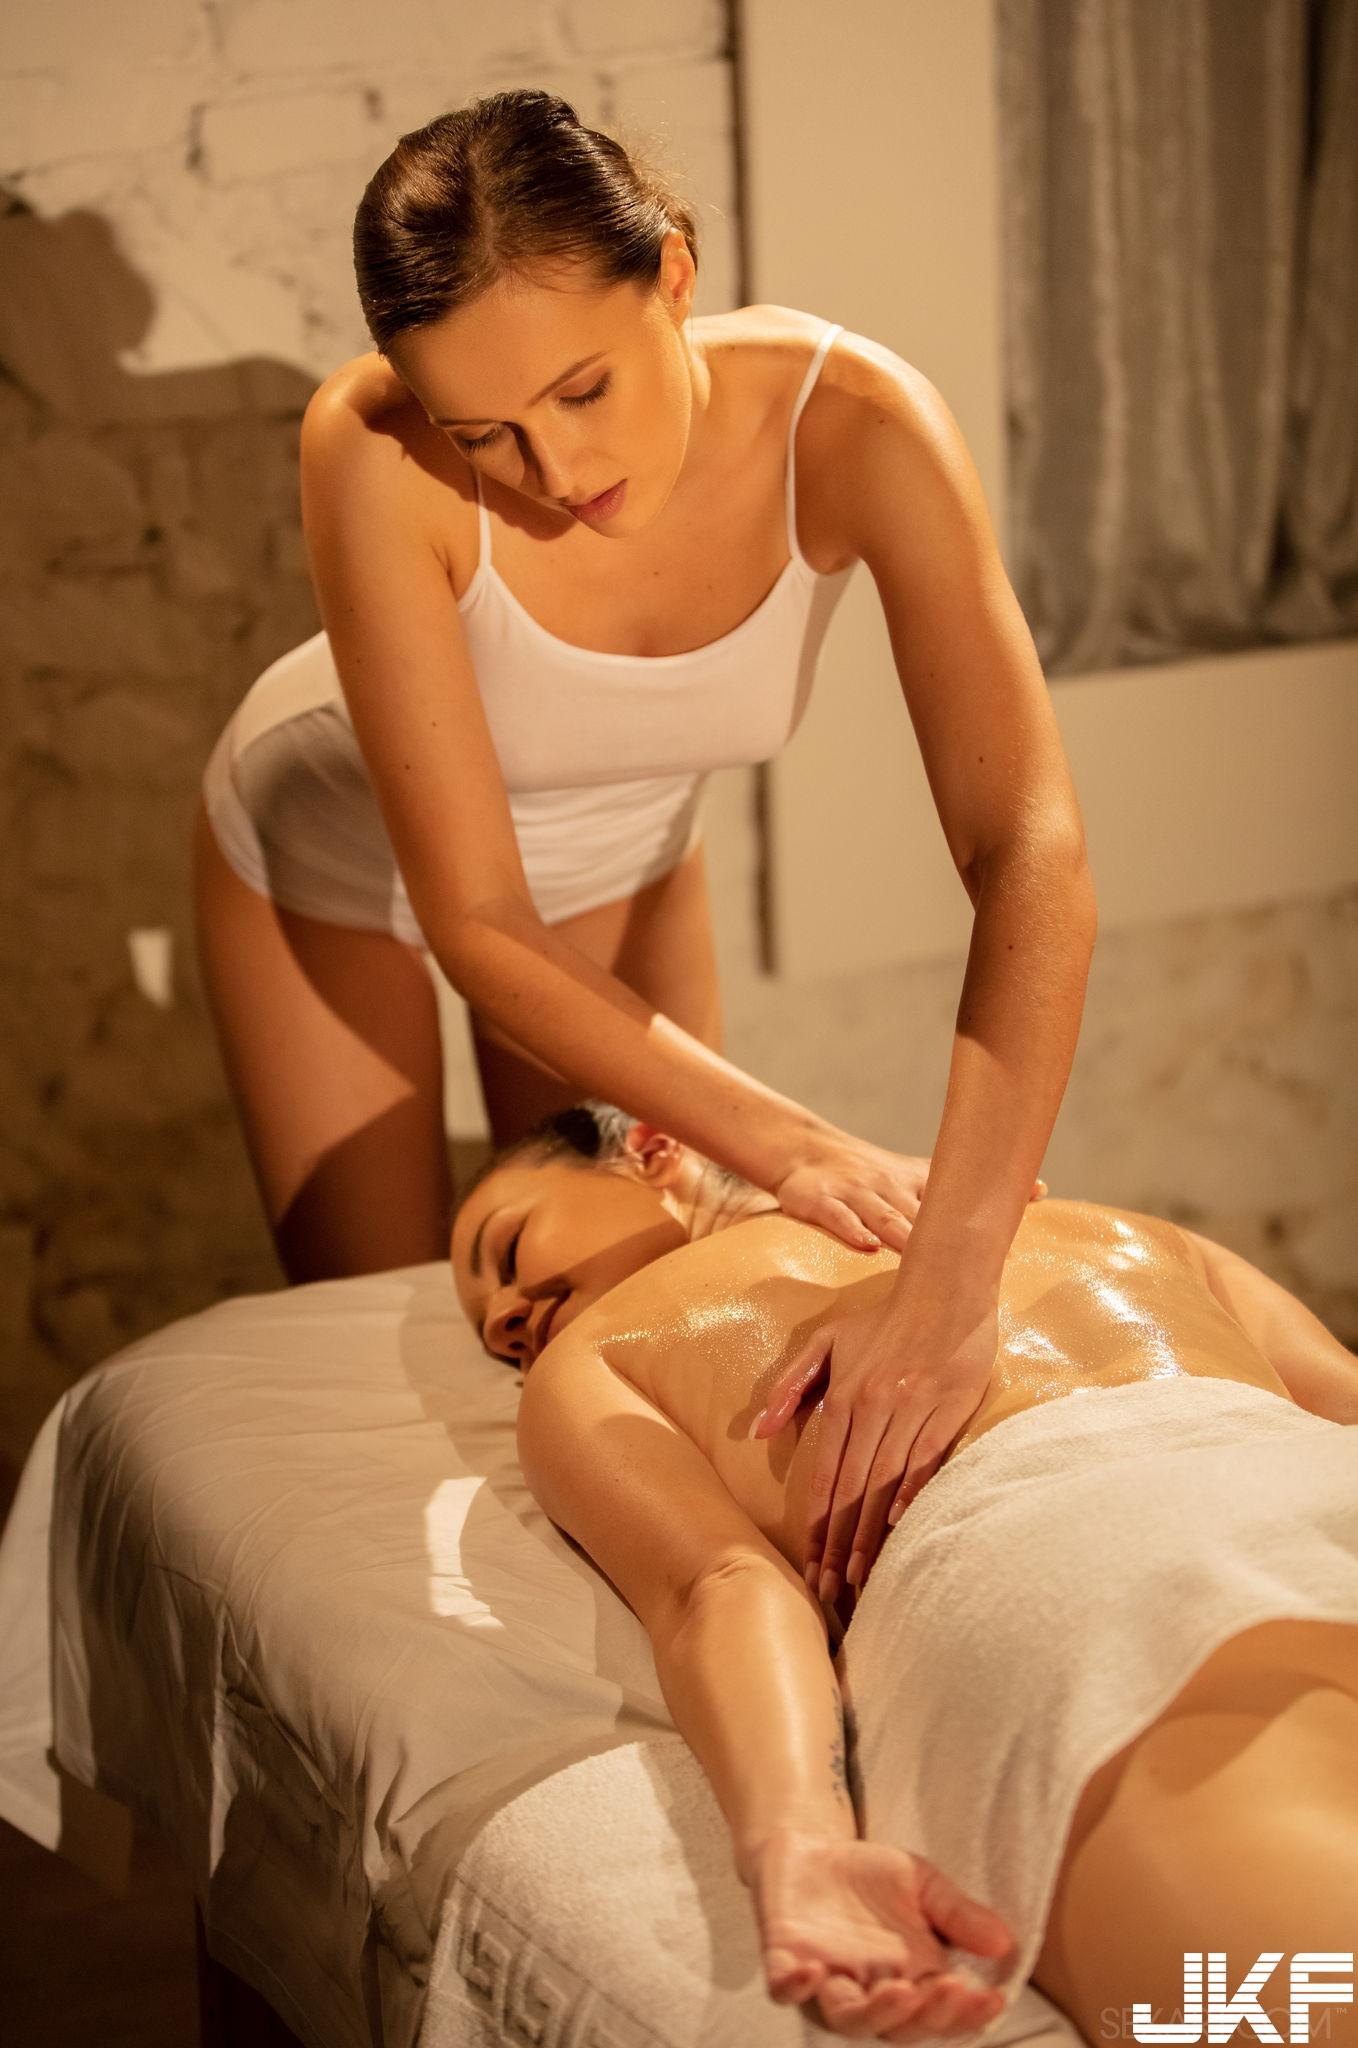 SexArt_Ritual-3_Elena-Vega--Stacy-Cruz_medium_0008.jpg